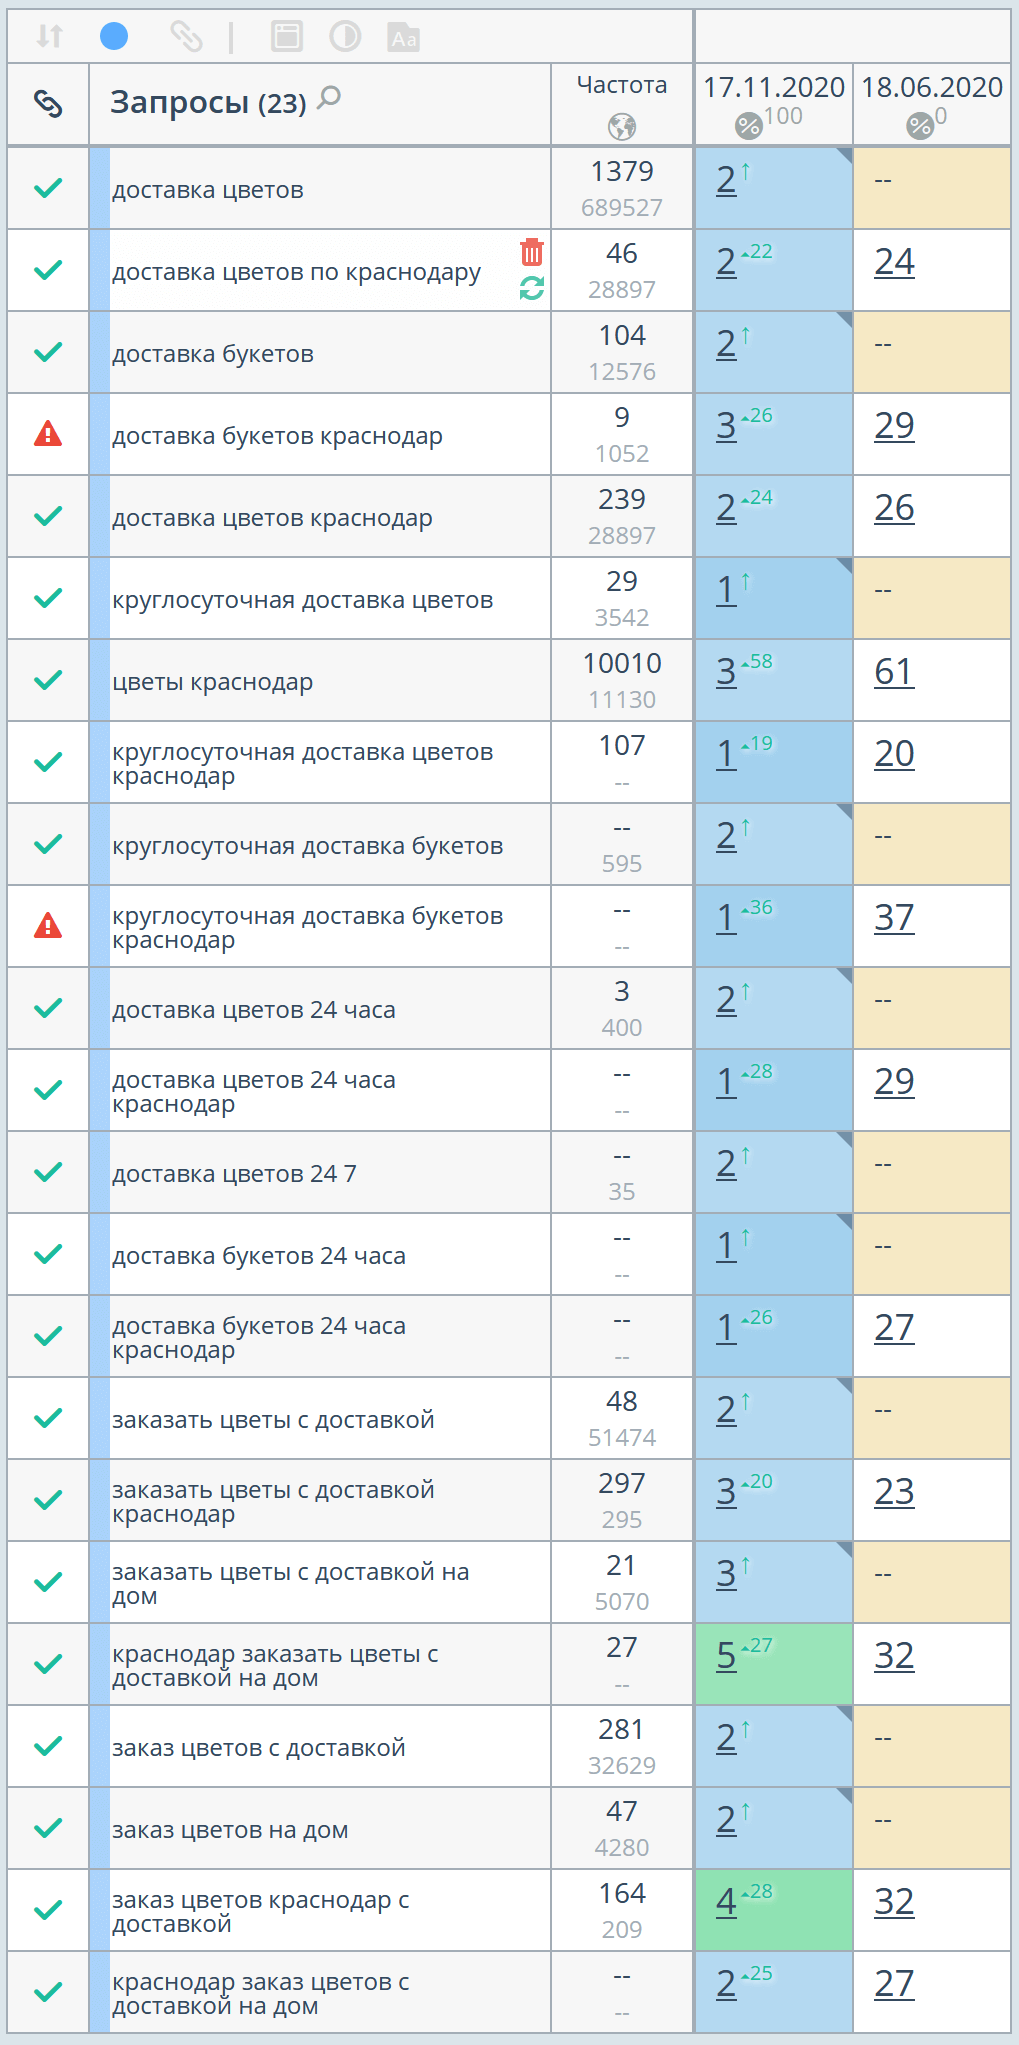 Рост позиций в Яндексе, регион Краснодар